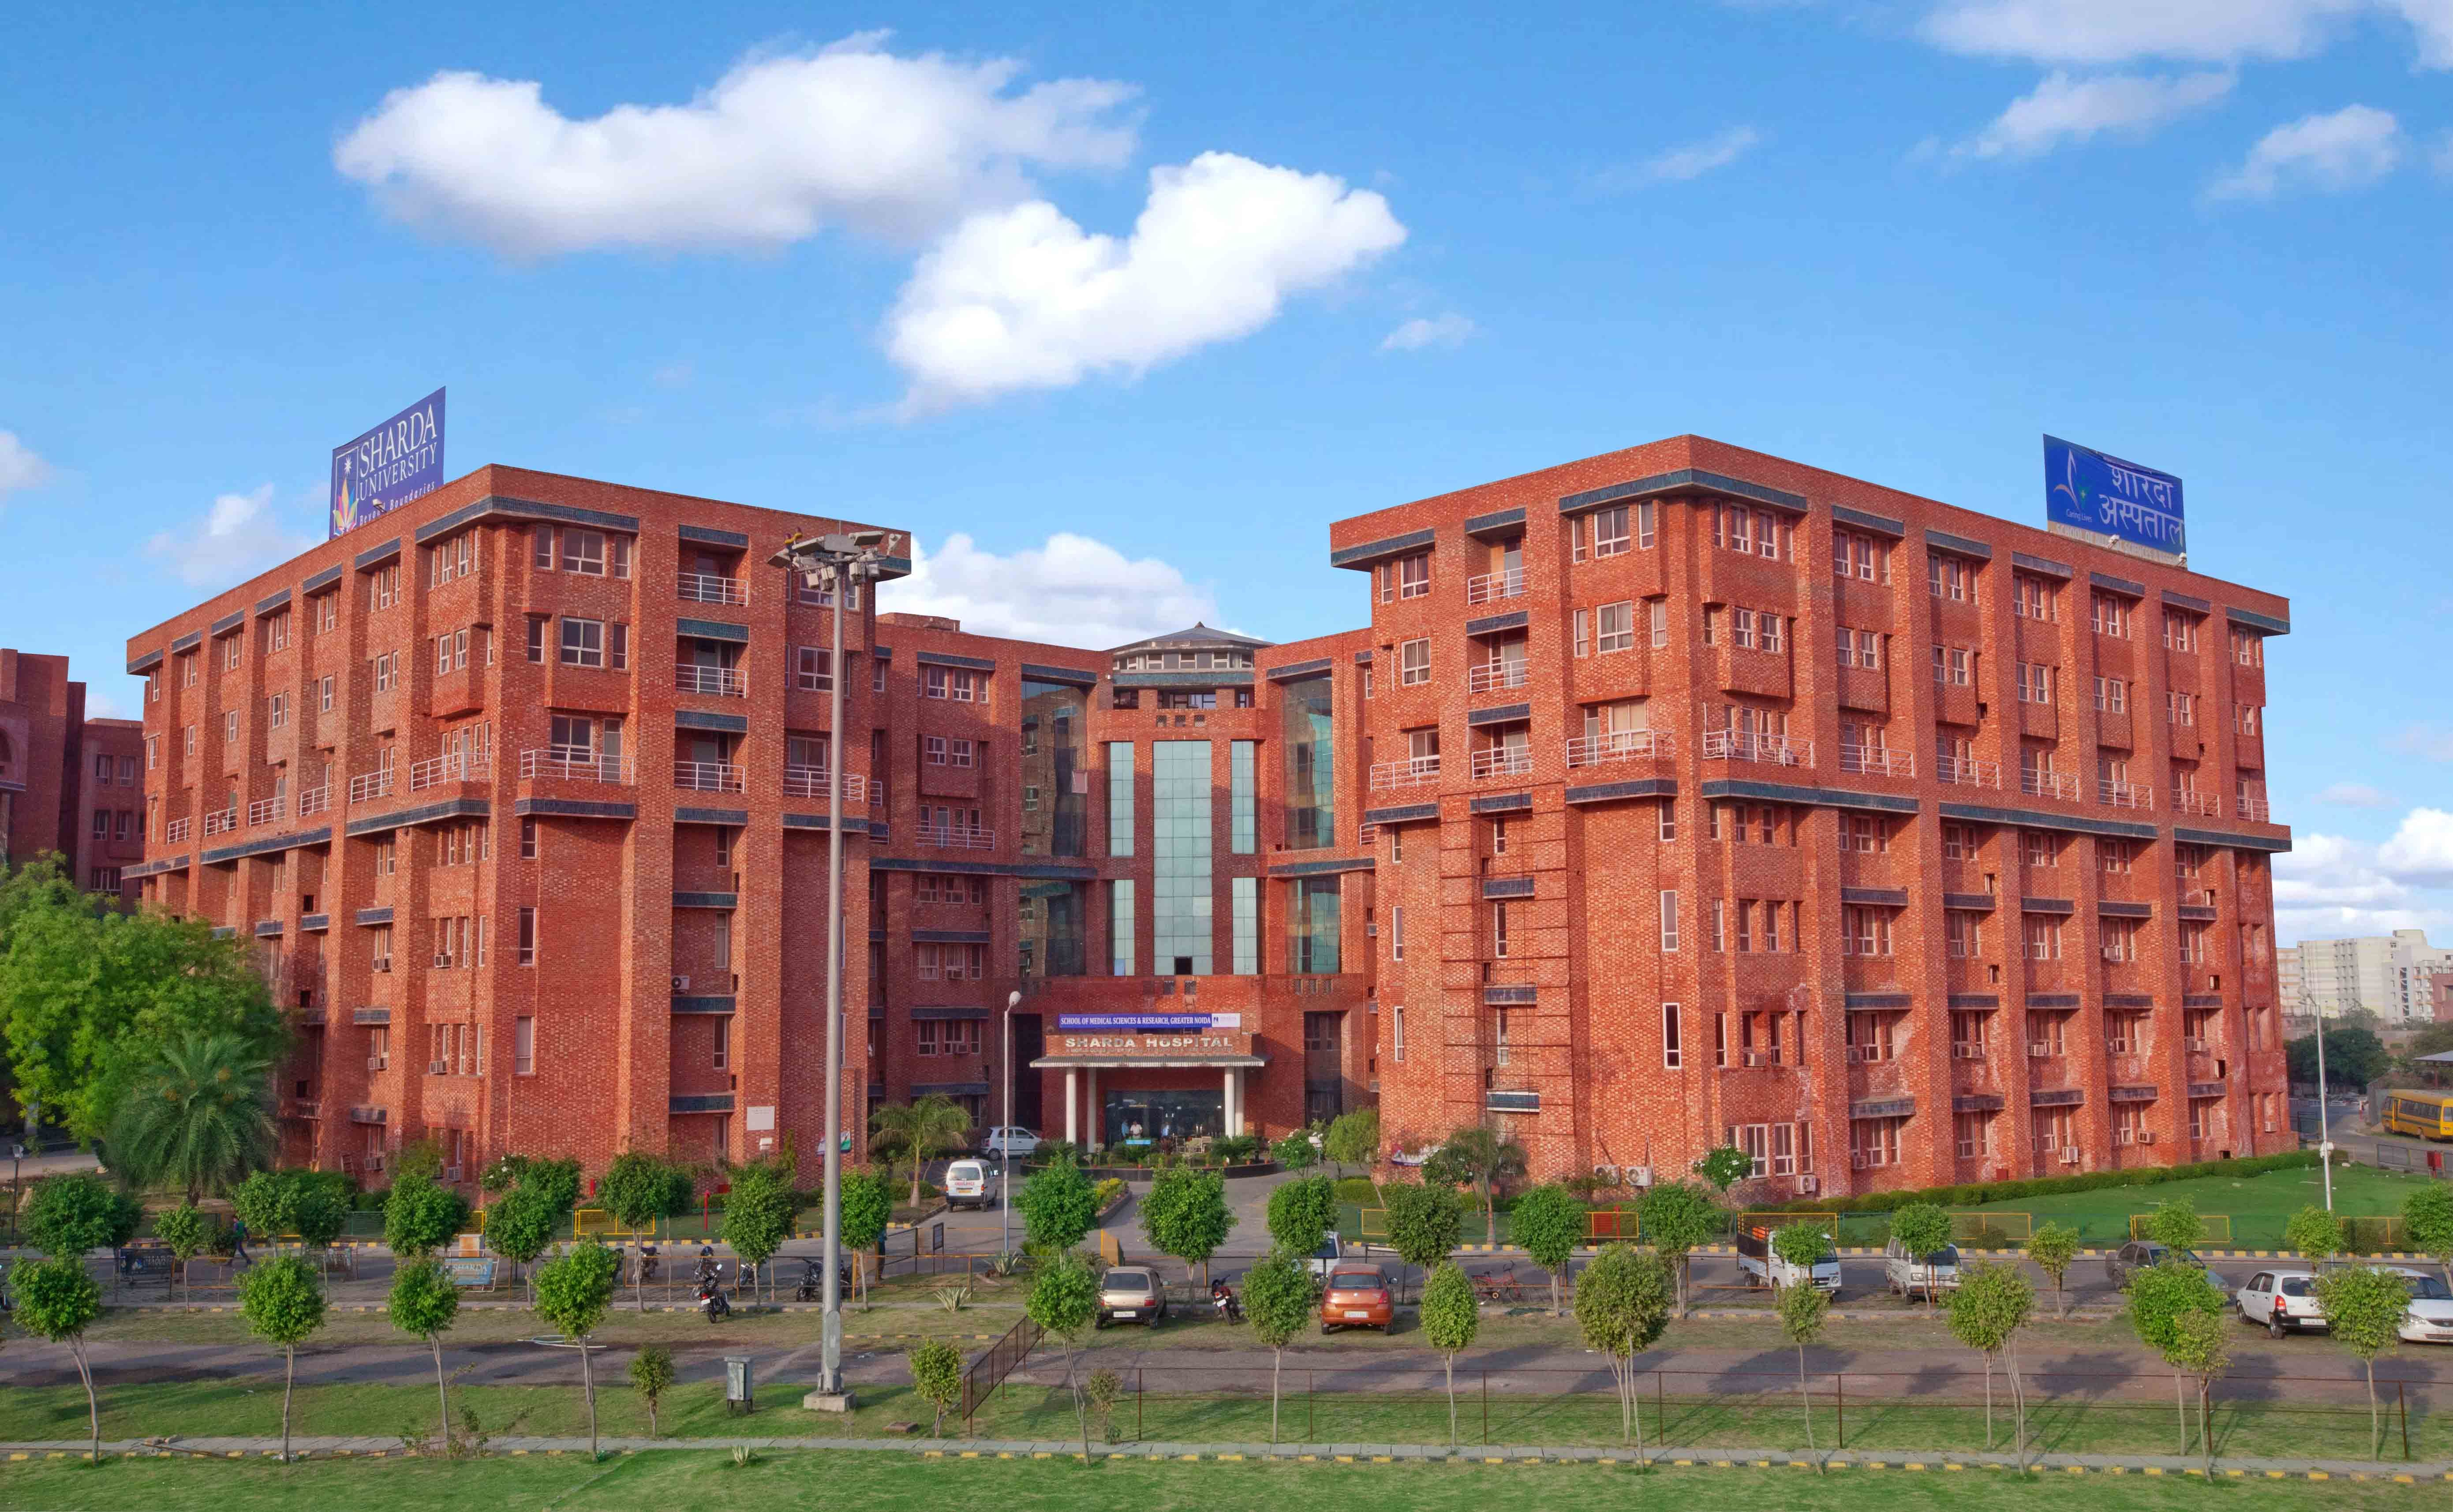 Sharda Hospital Sharda University Campus, Greater Noida